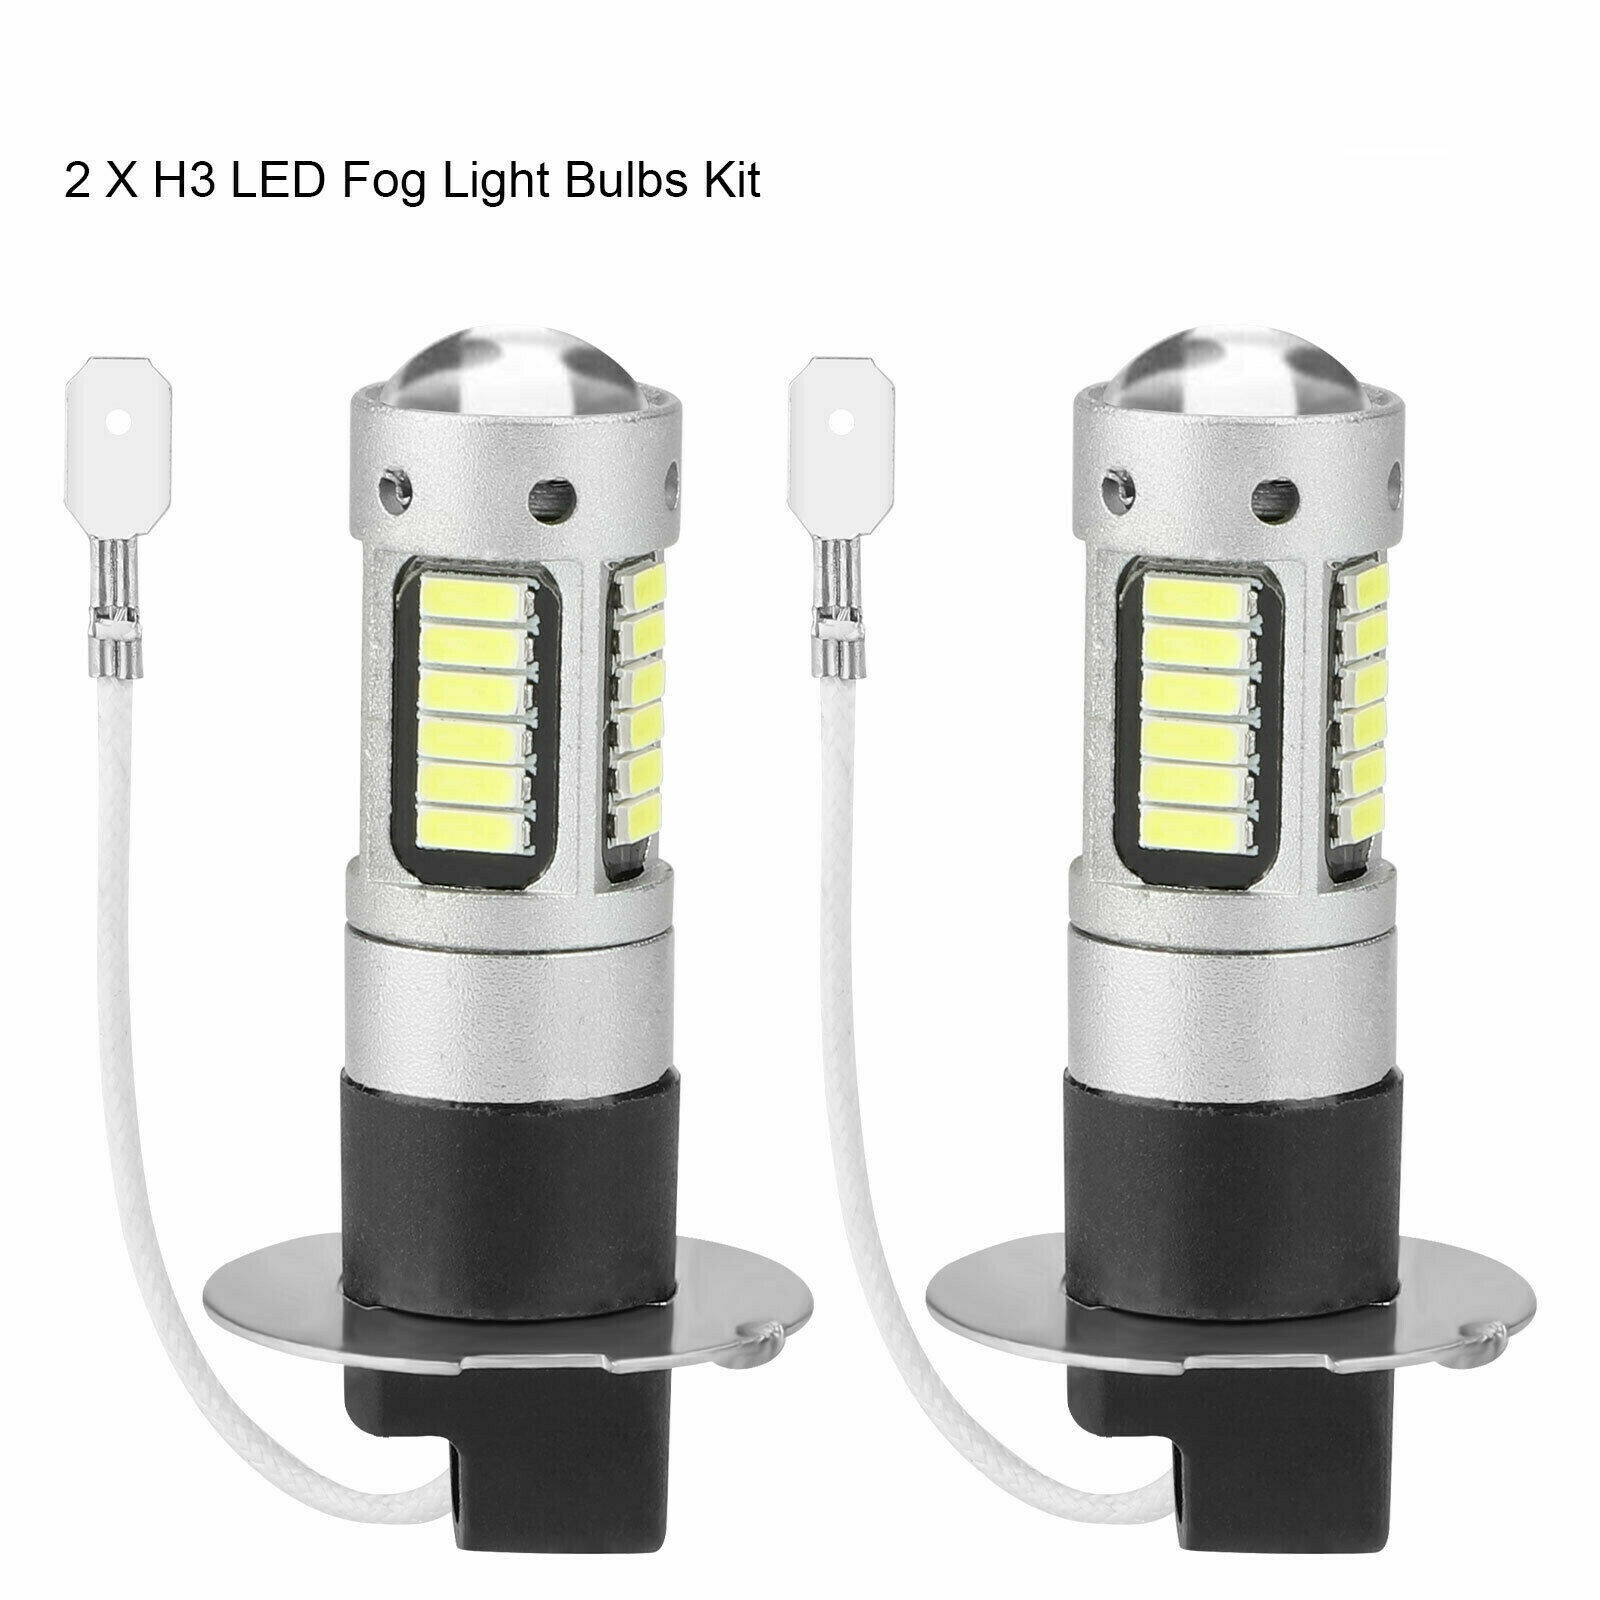 H3 6000K White Led Fog Driving Light Bulbs Conversion Kit Super Bright Drl Bagged